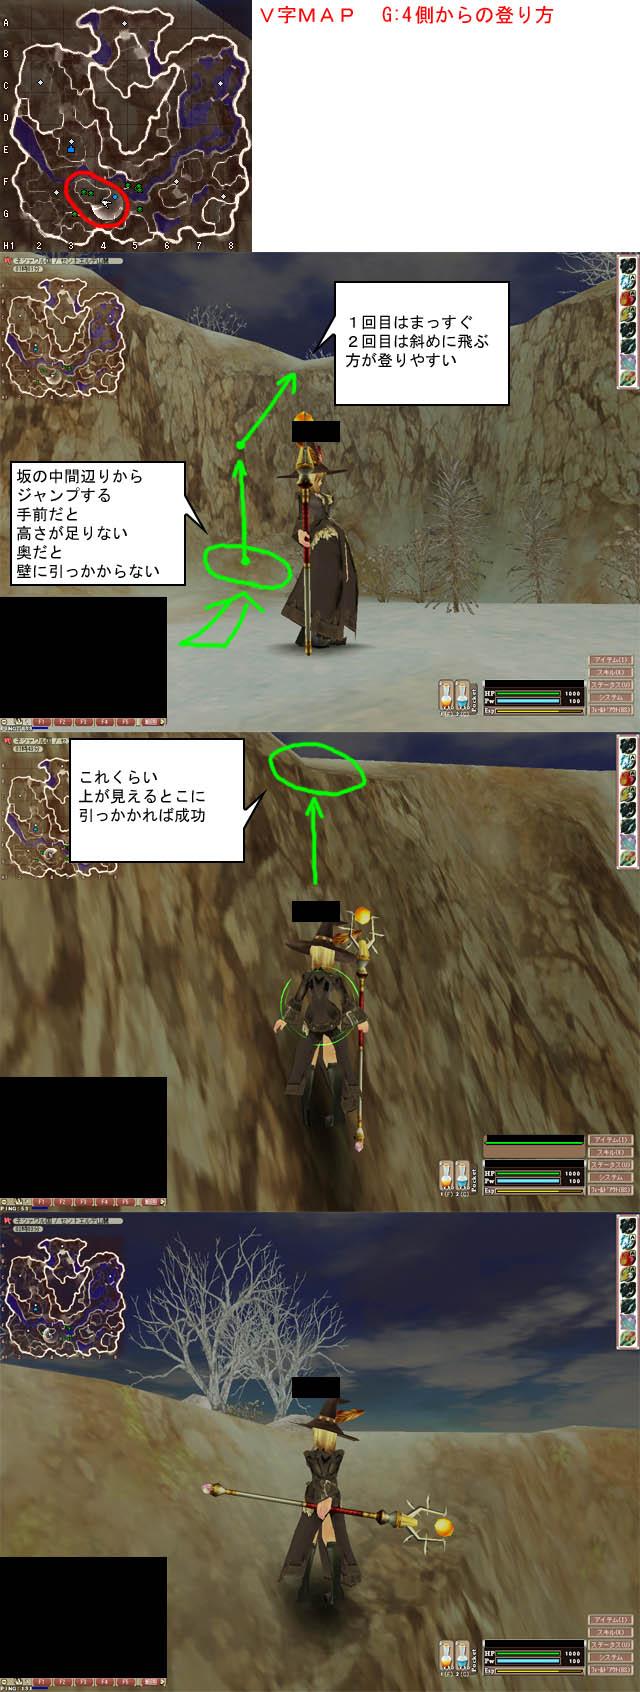 MAPV_G4.jpg